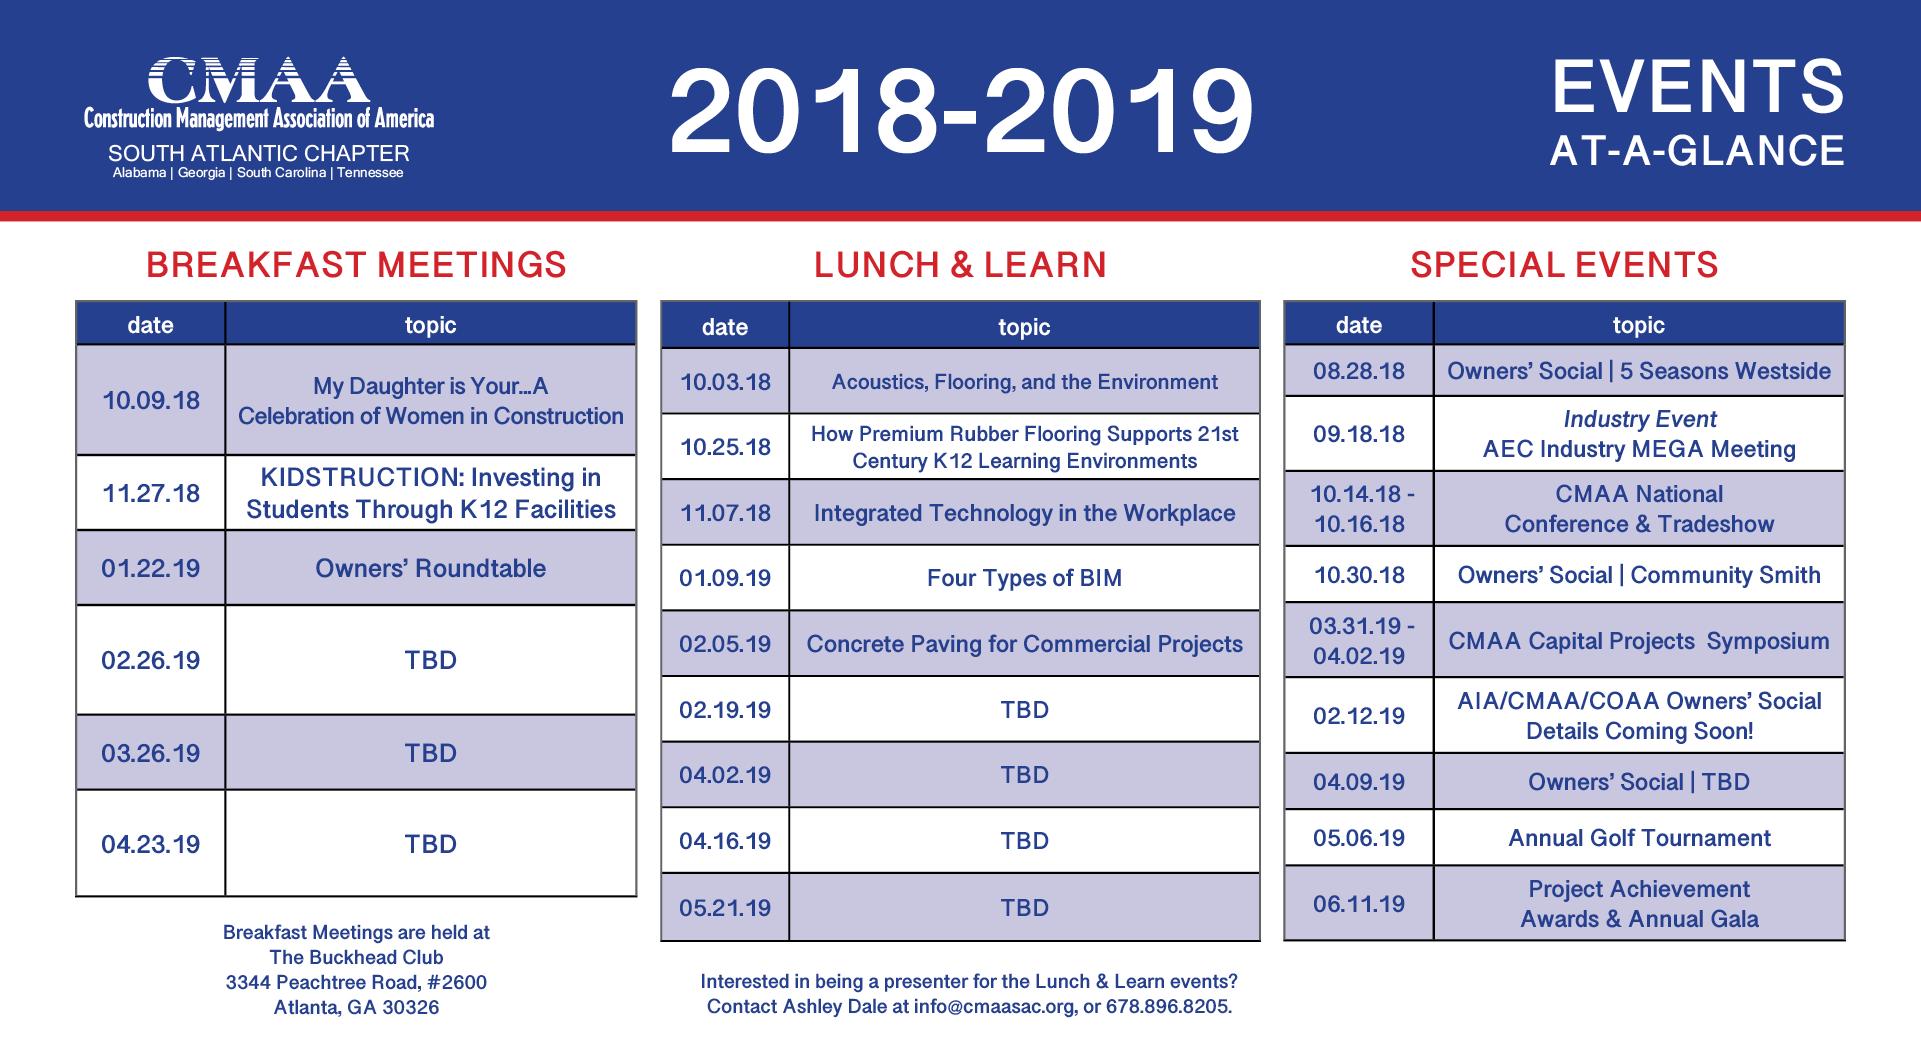 calendar at a glance 2018-19 | 10.18.18